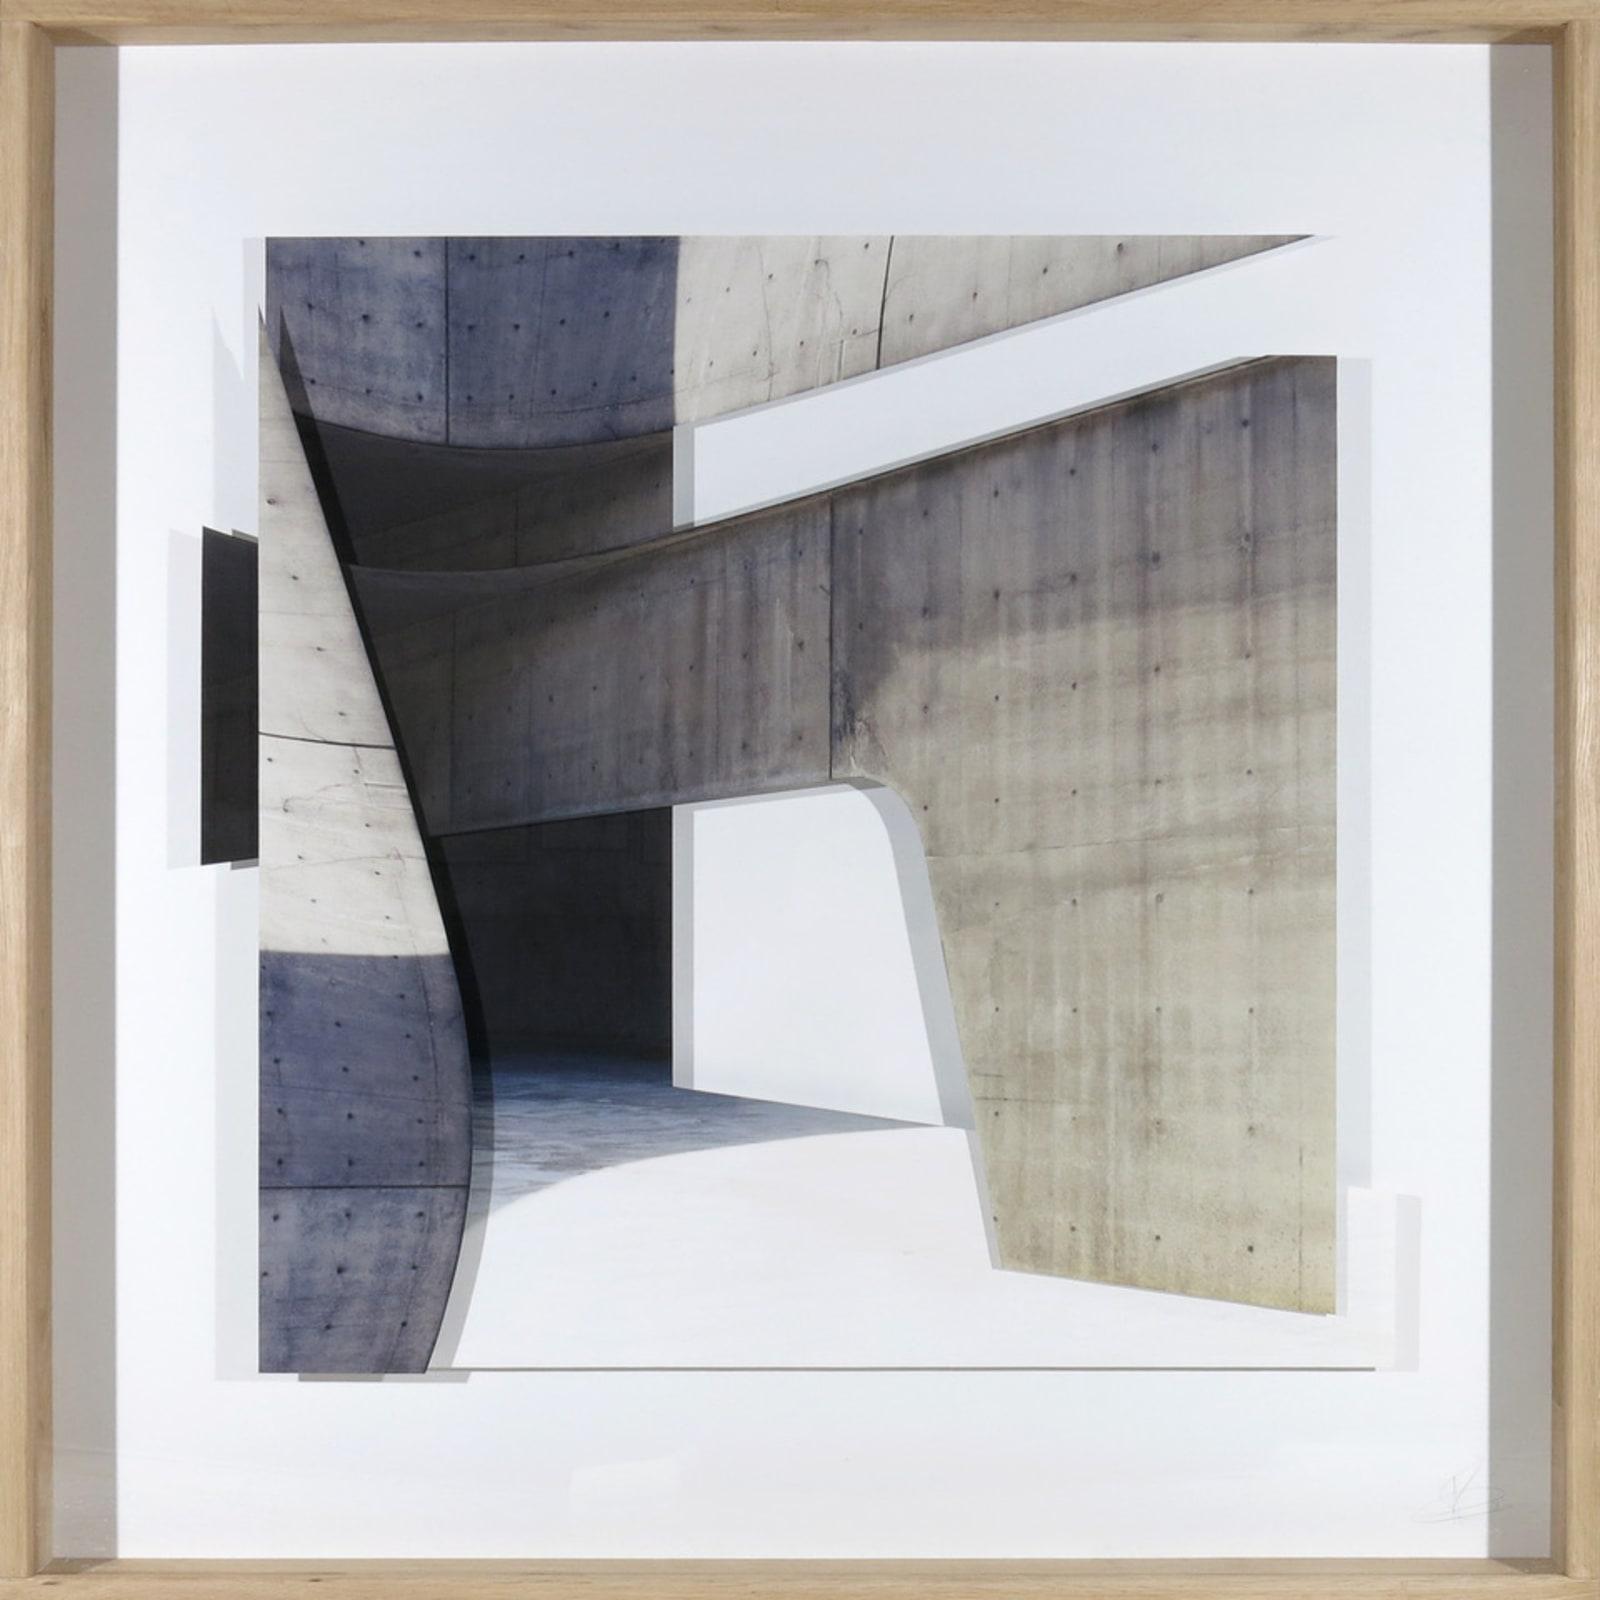 Patrik Grijalvo, Series Gravtación Visual. Dongdaemun Design Plaza, Seul / Zaha Hadid, 2019